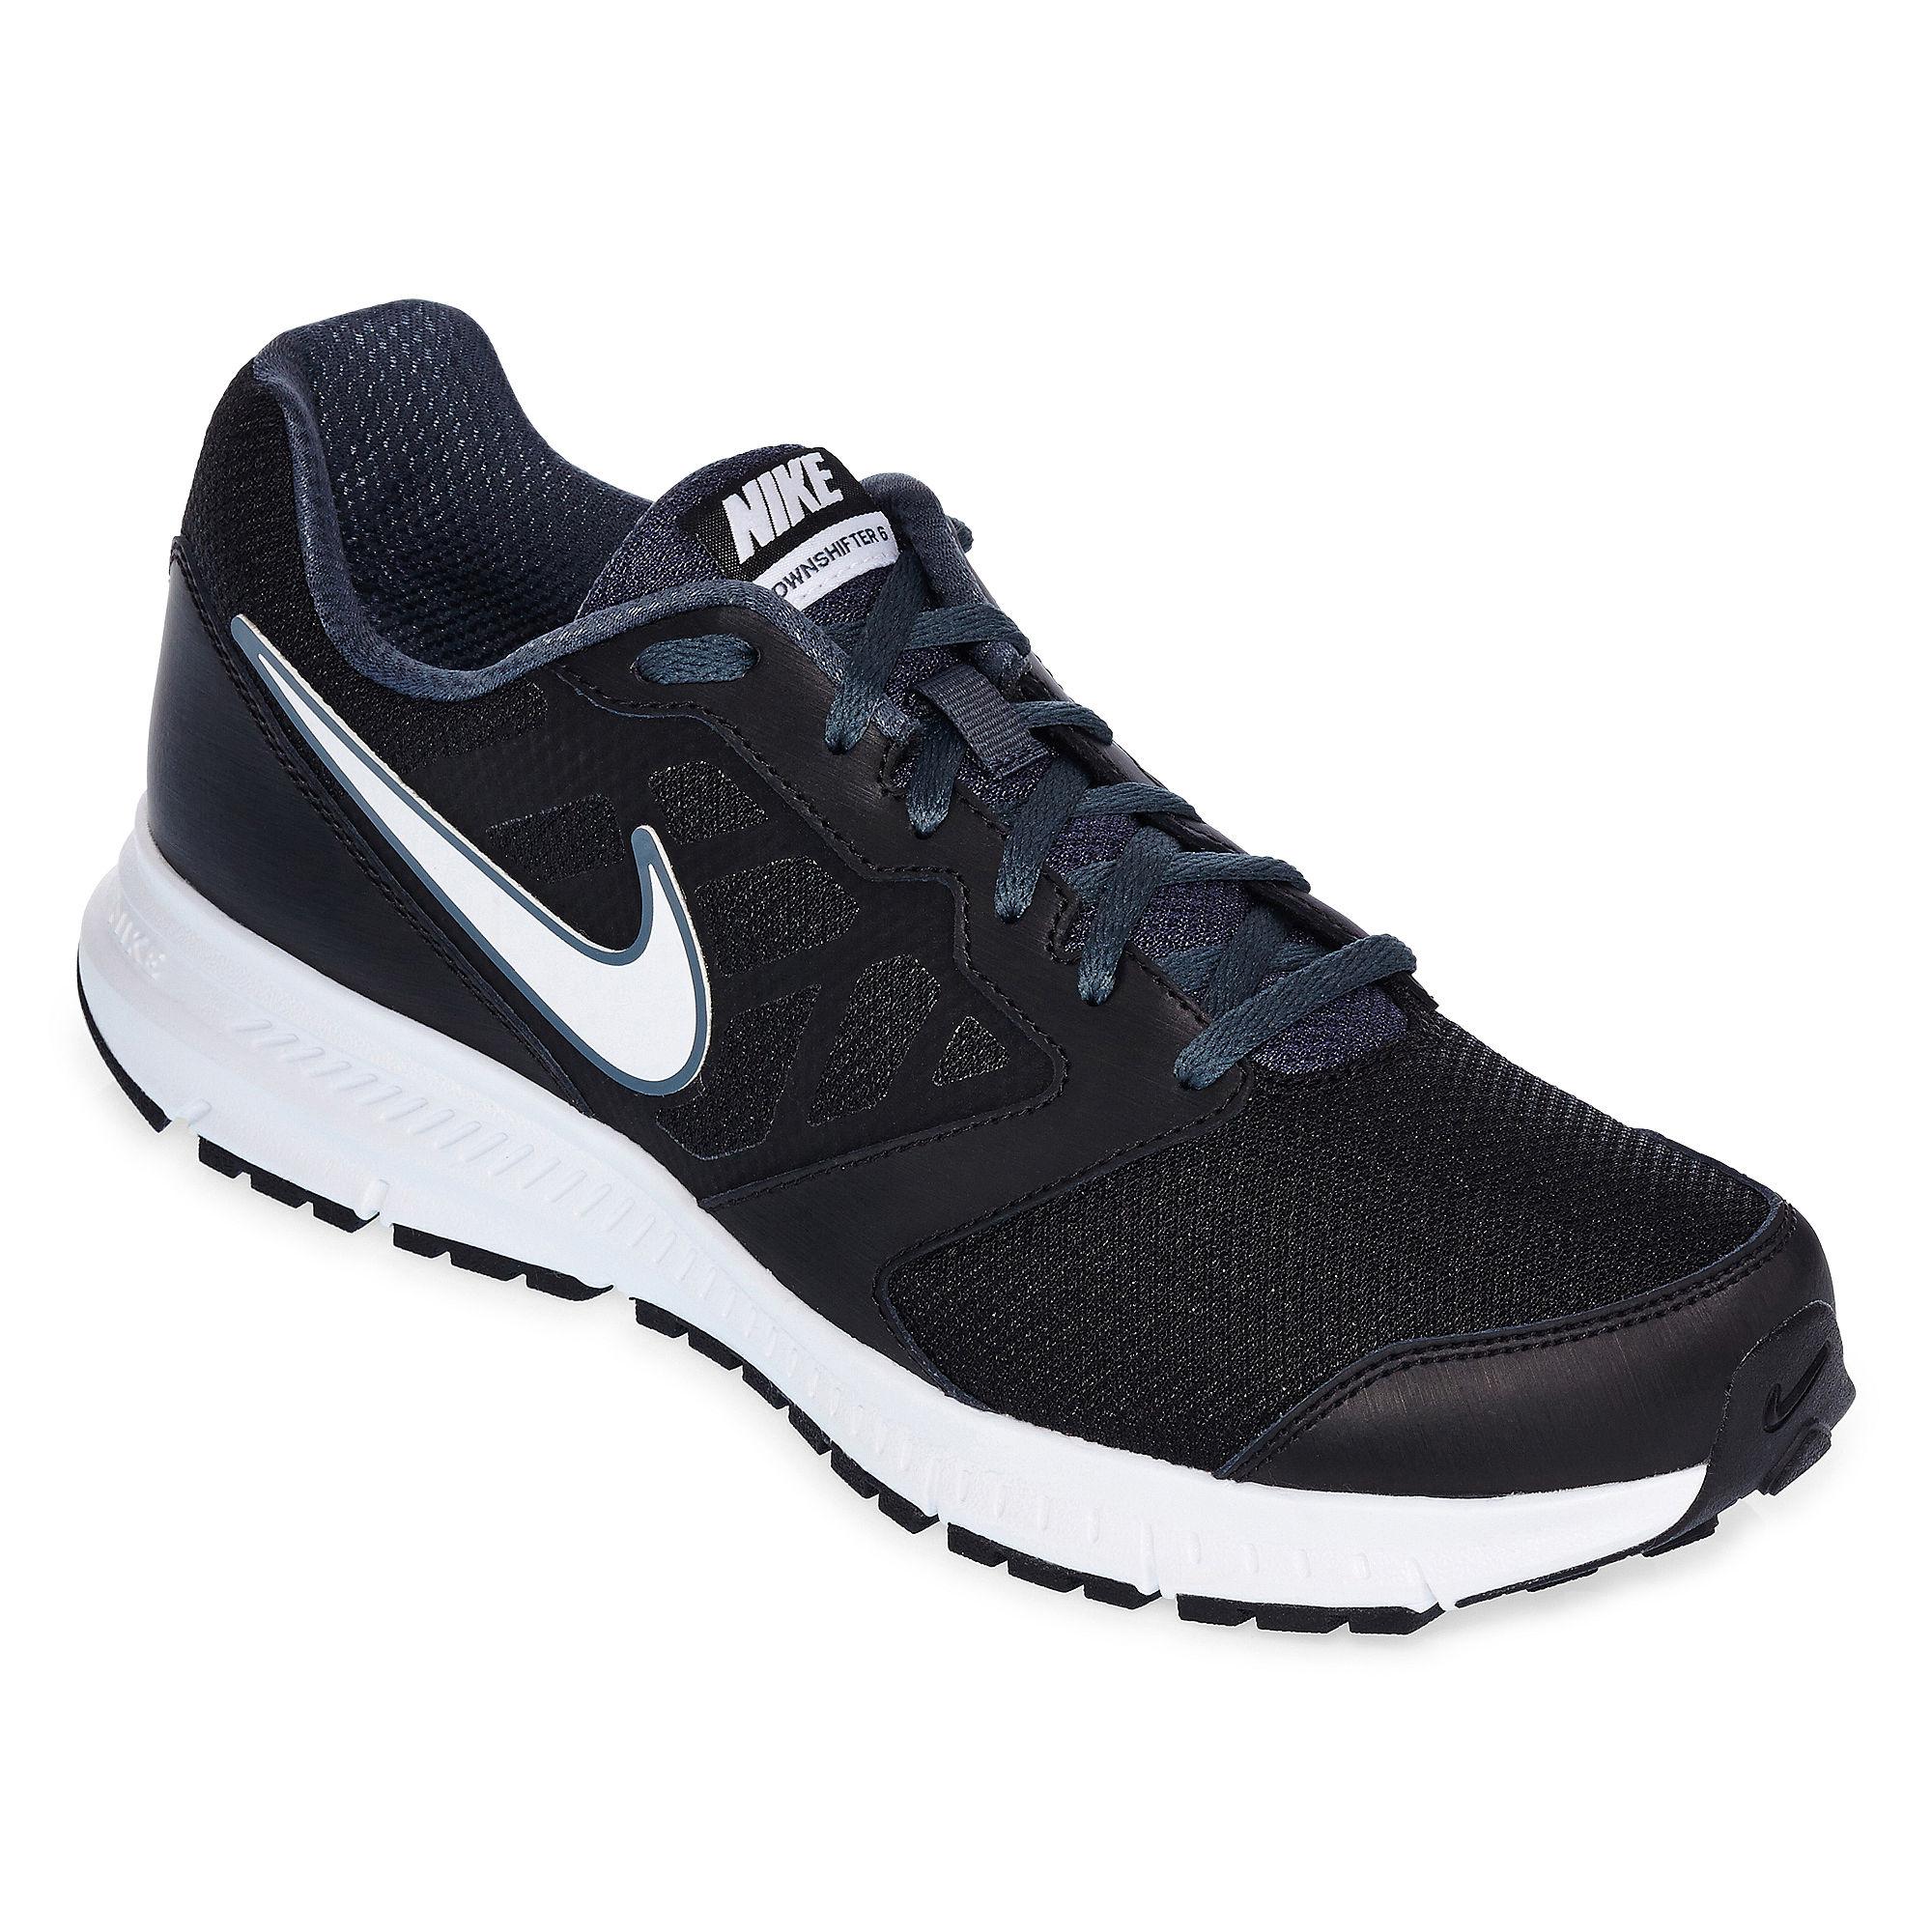 1312f630e2ff UPC 820652611481 - Nike Downshifter 6 Mens Running Shoes